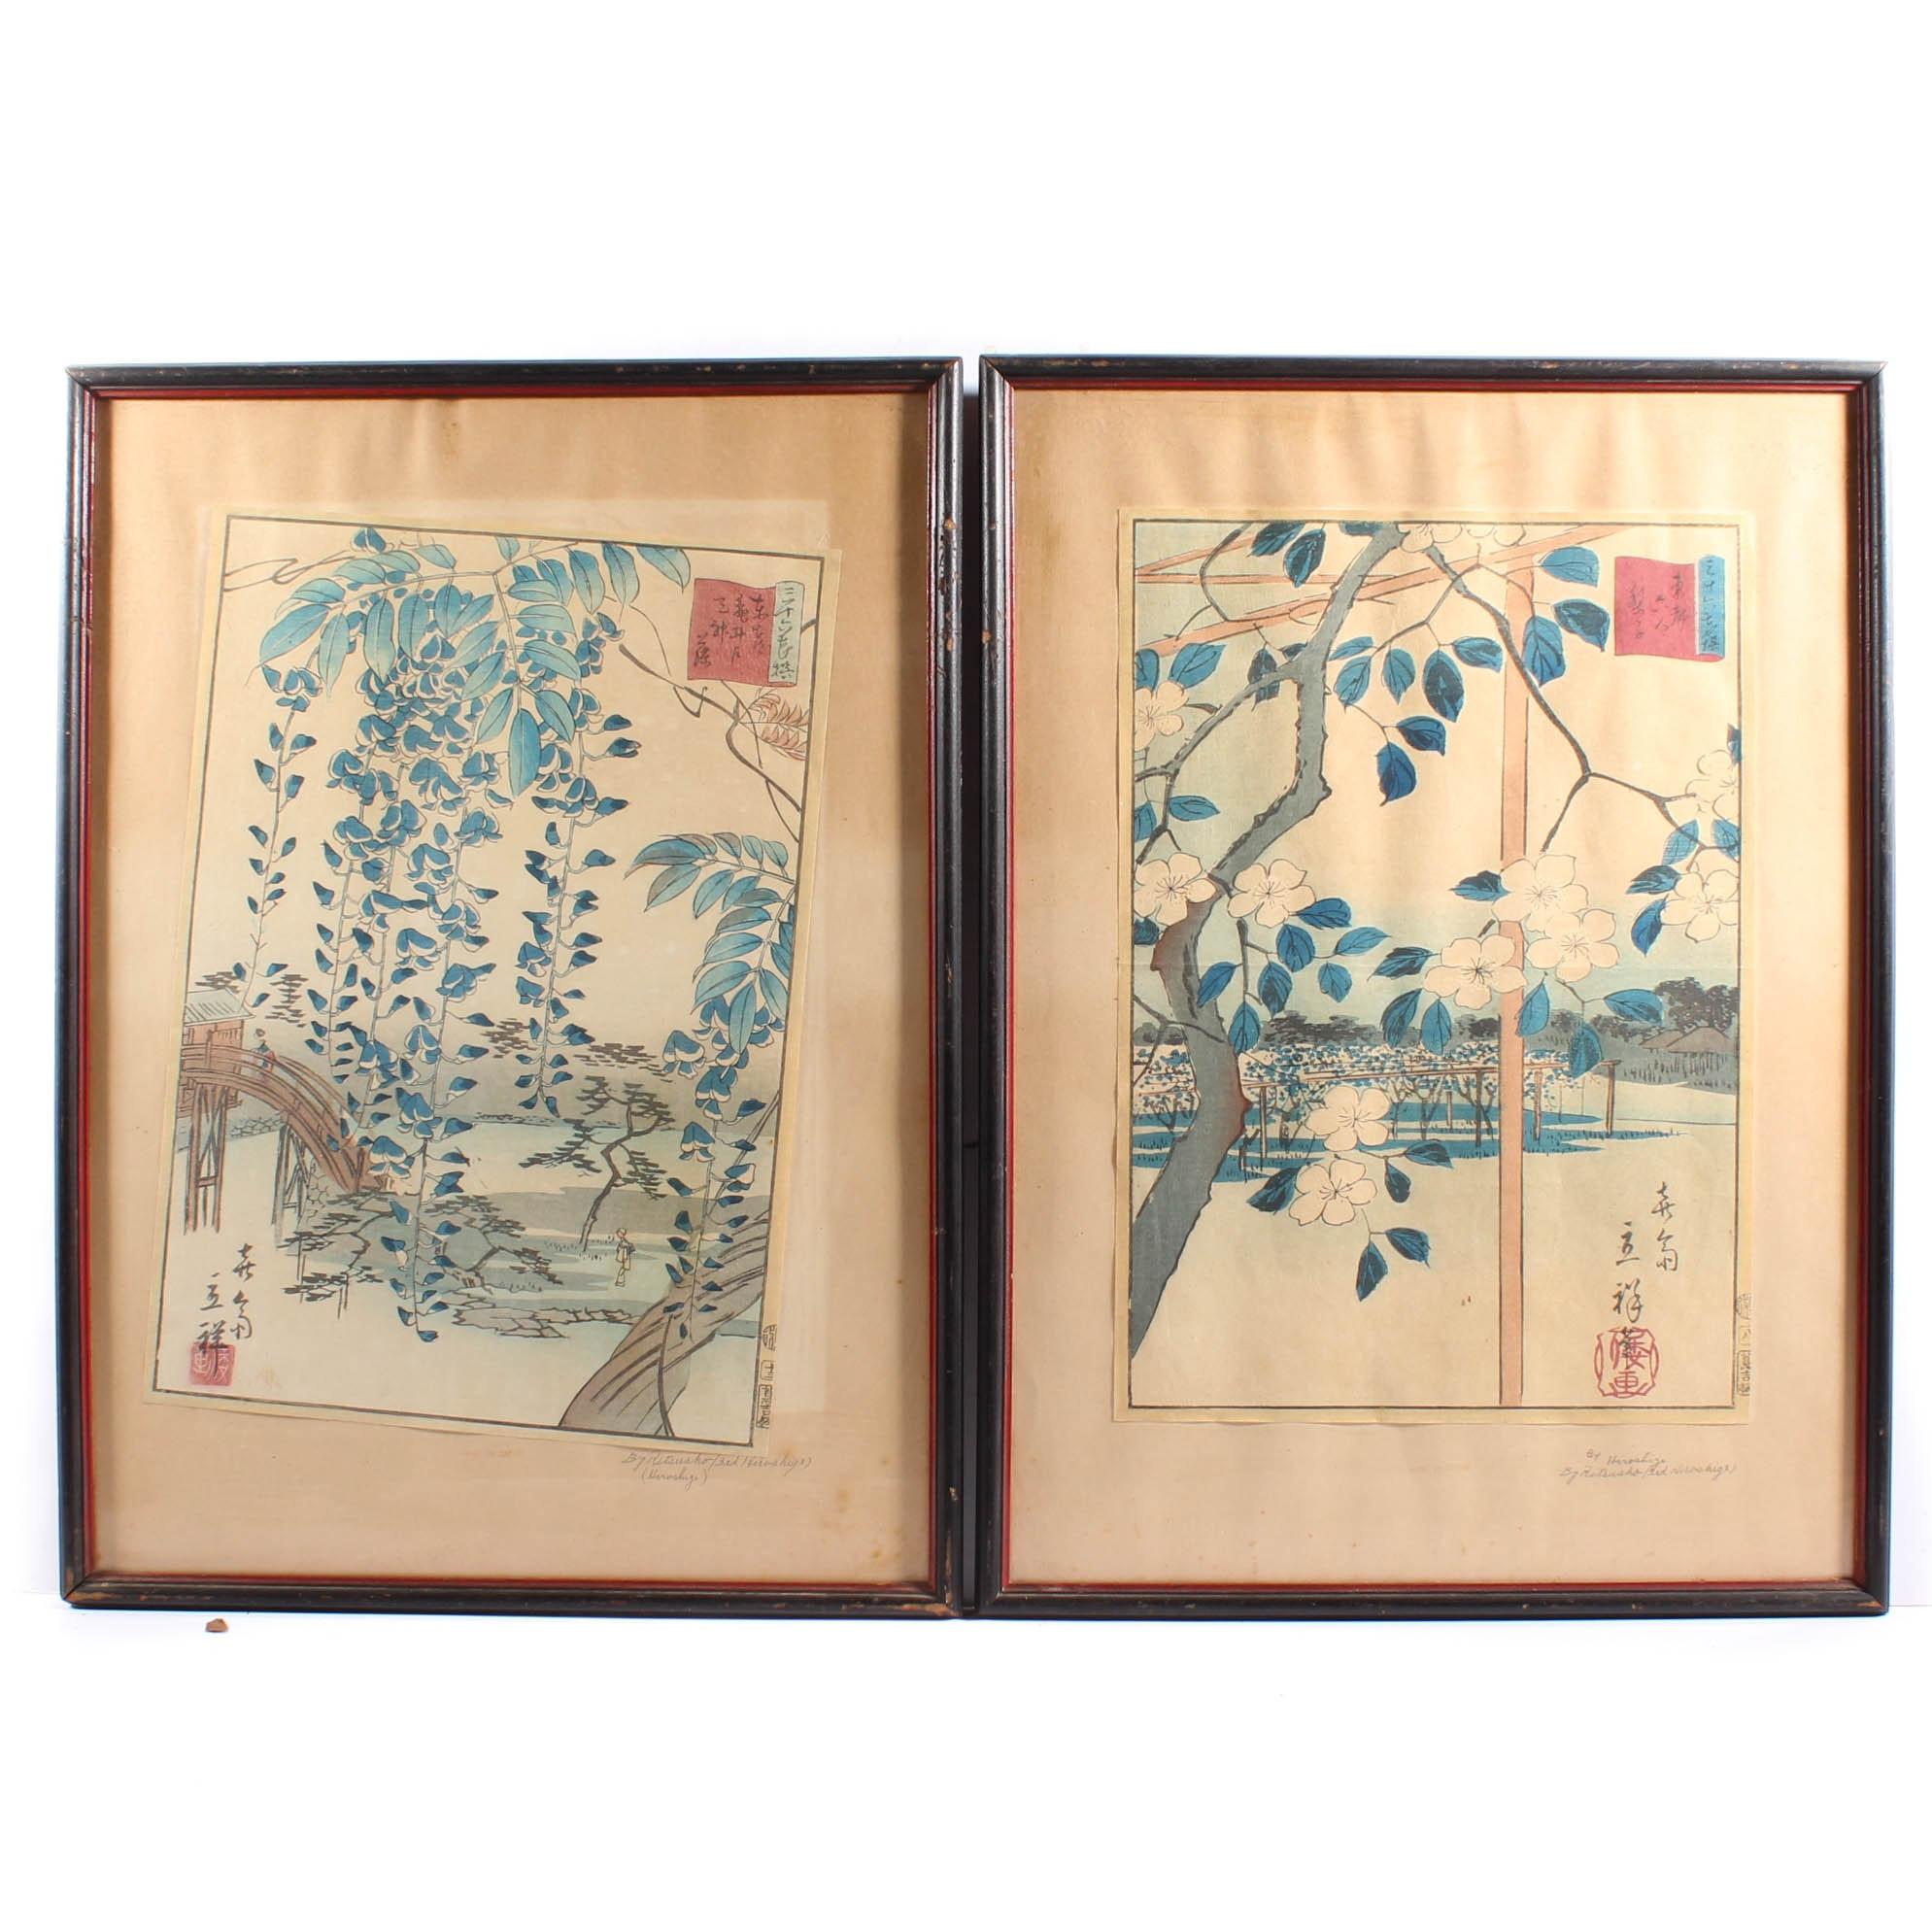 Vintage Hiroshige Japanese Woodblock Prints